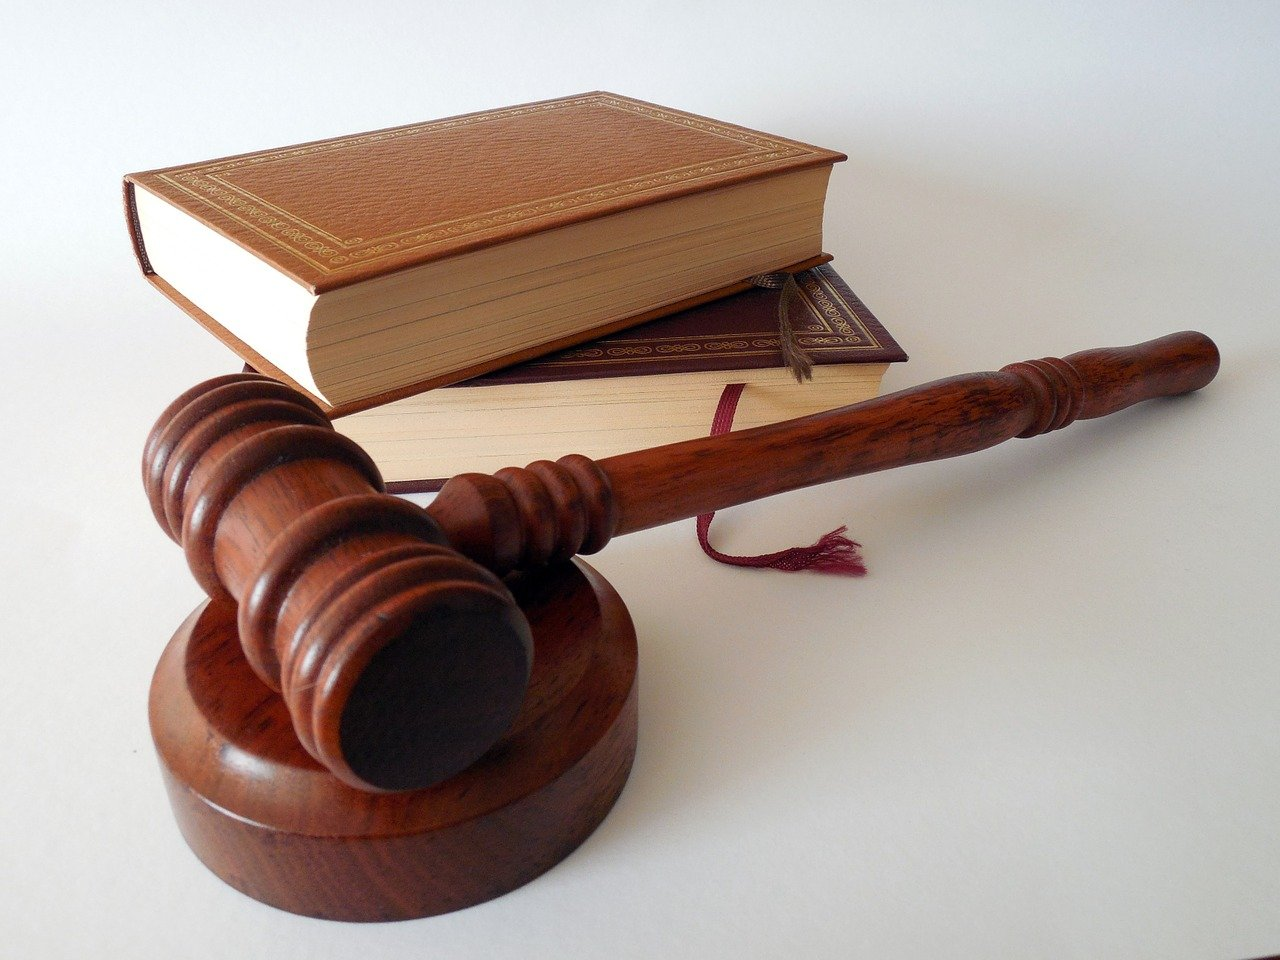 Thai Partner Drags Bithumb Hong Kong Subsidiaries To Civil Suit